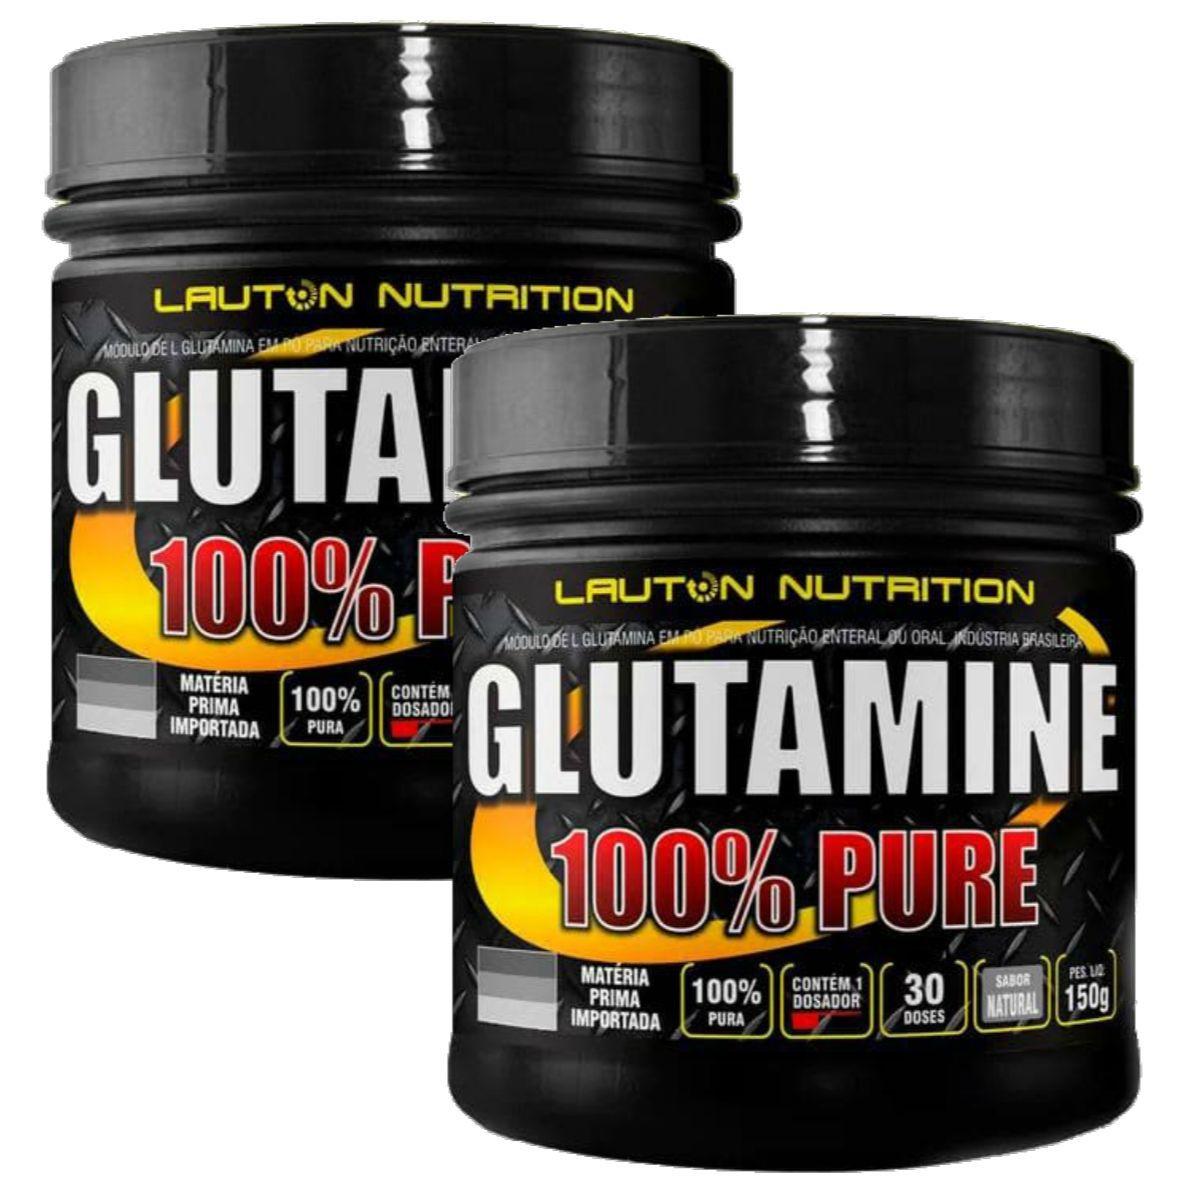 Kit 2 Glutamina Power 100% Pura 150g - Lauton Nutrition